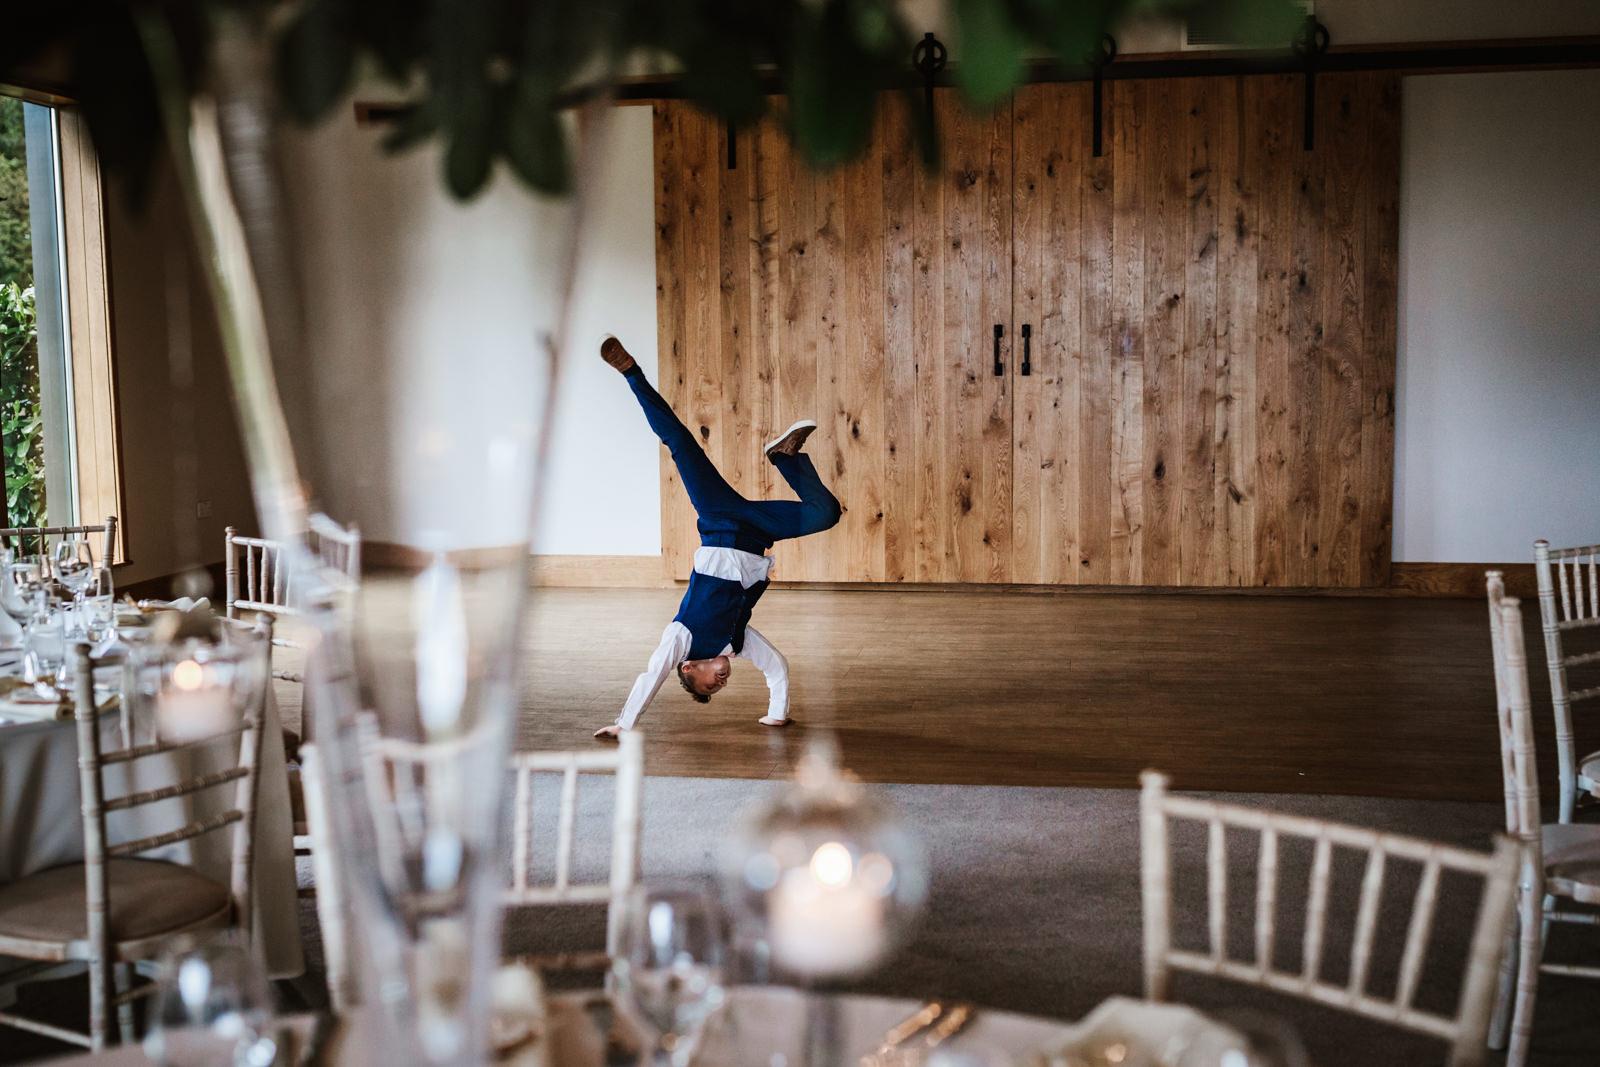 Boy doing a cartwheel